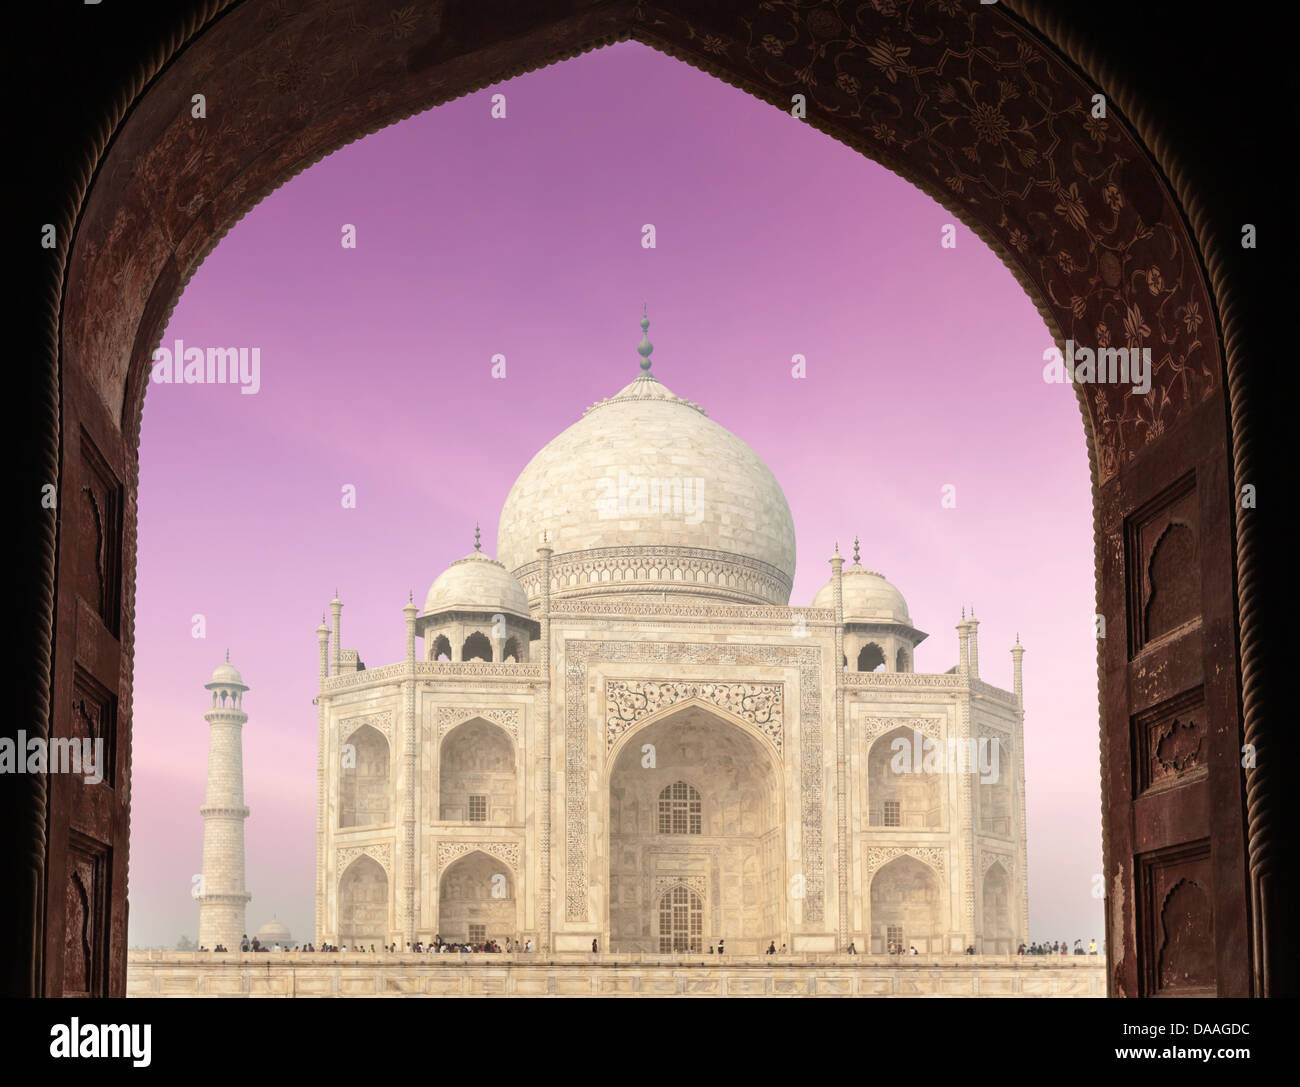 Taj Mahal a través de arco, símbolo indio - viajes de India de fondo. Agra, Uttar Pradesh, India Imagen De Stock